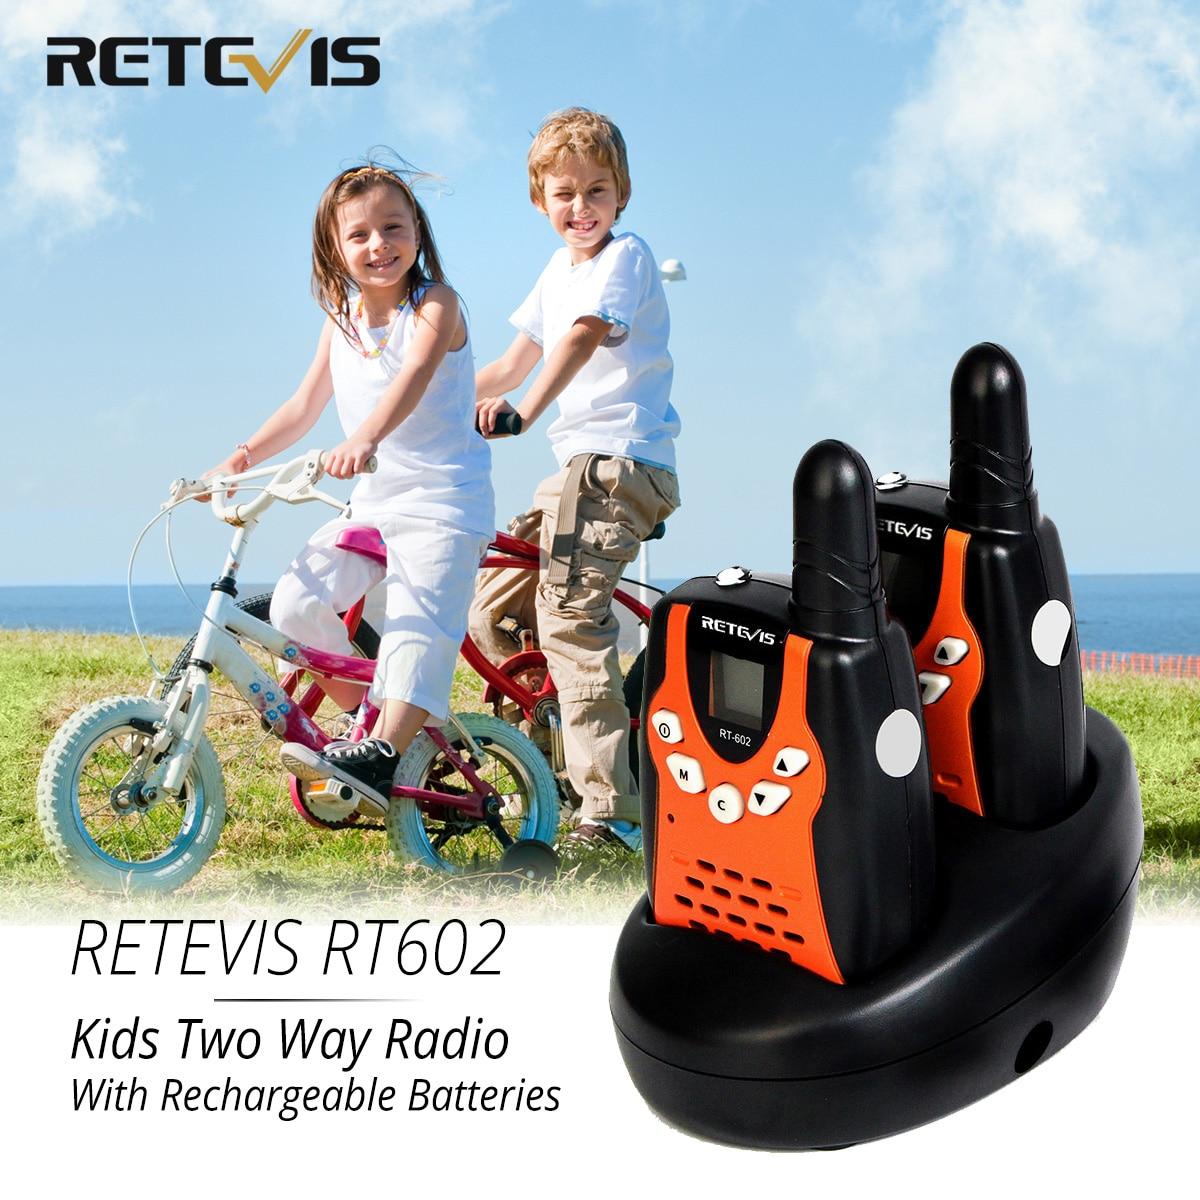 Retevis RT602 Walkie Talkie Kids Rechargeable 2pcs PMR446 FRS 0.5W Children Toy Two-way Radio Flashlight Festival Birthday Gift